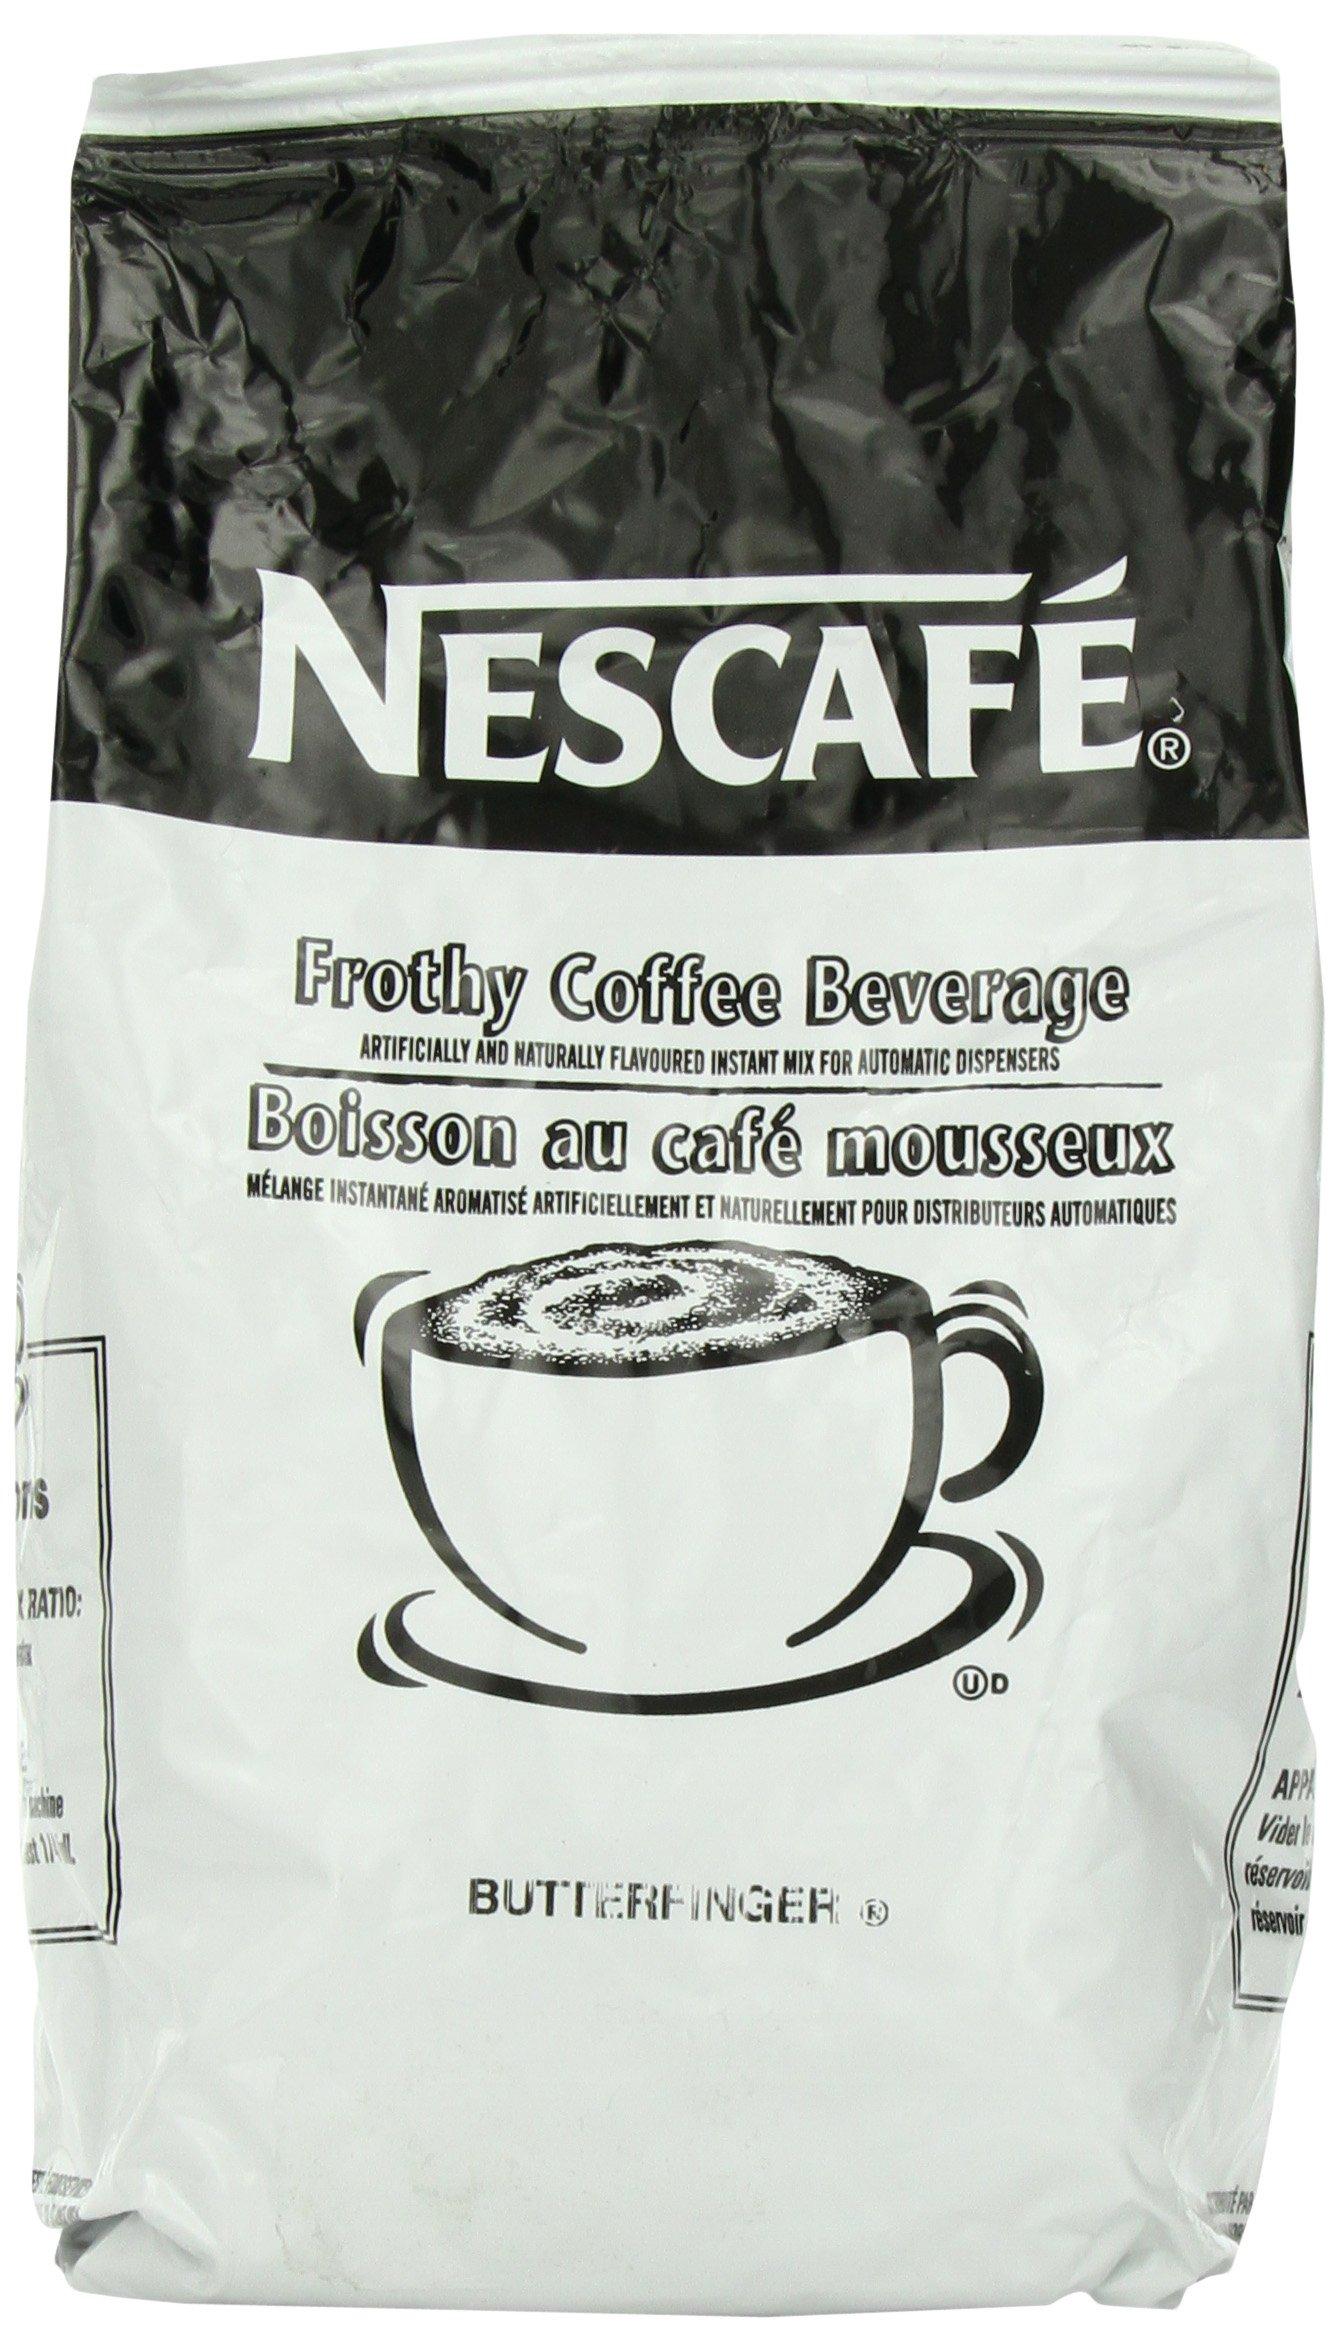 Nescafe Coffee, Butterfinger Cappuccino Mix, 32 Ounce Bag